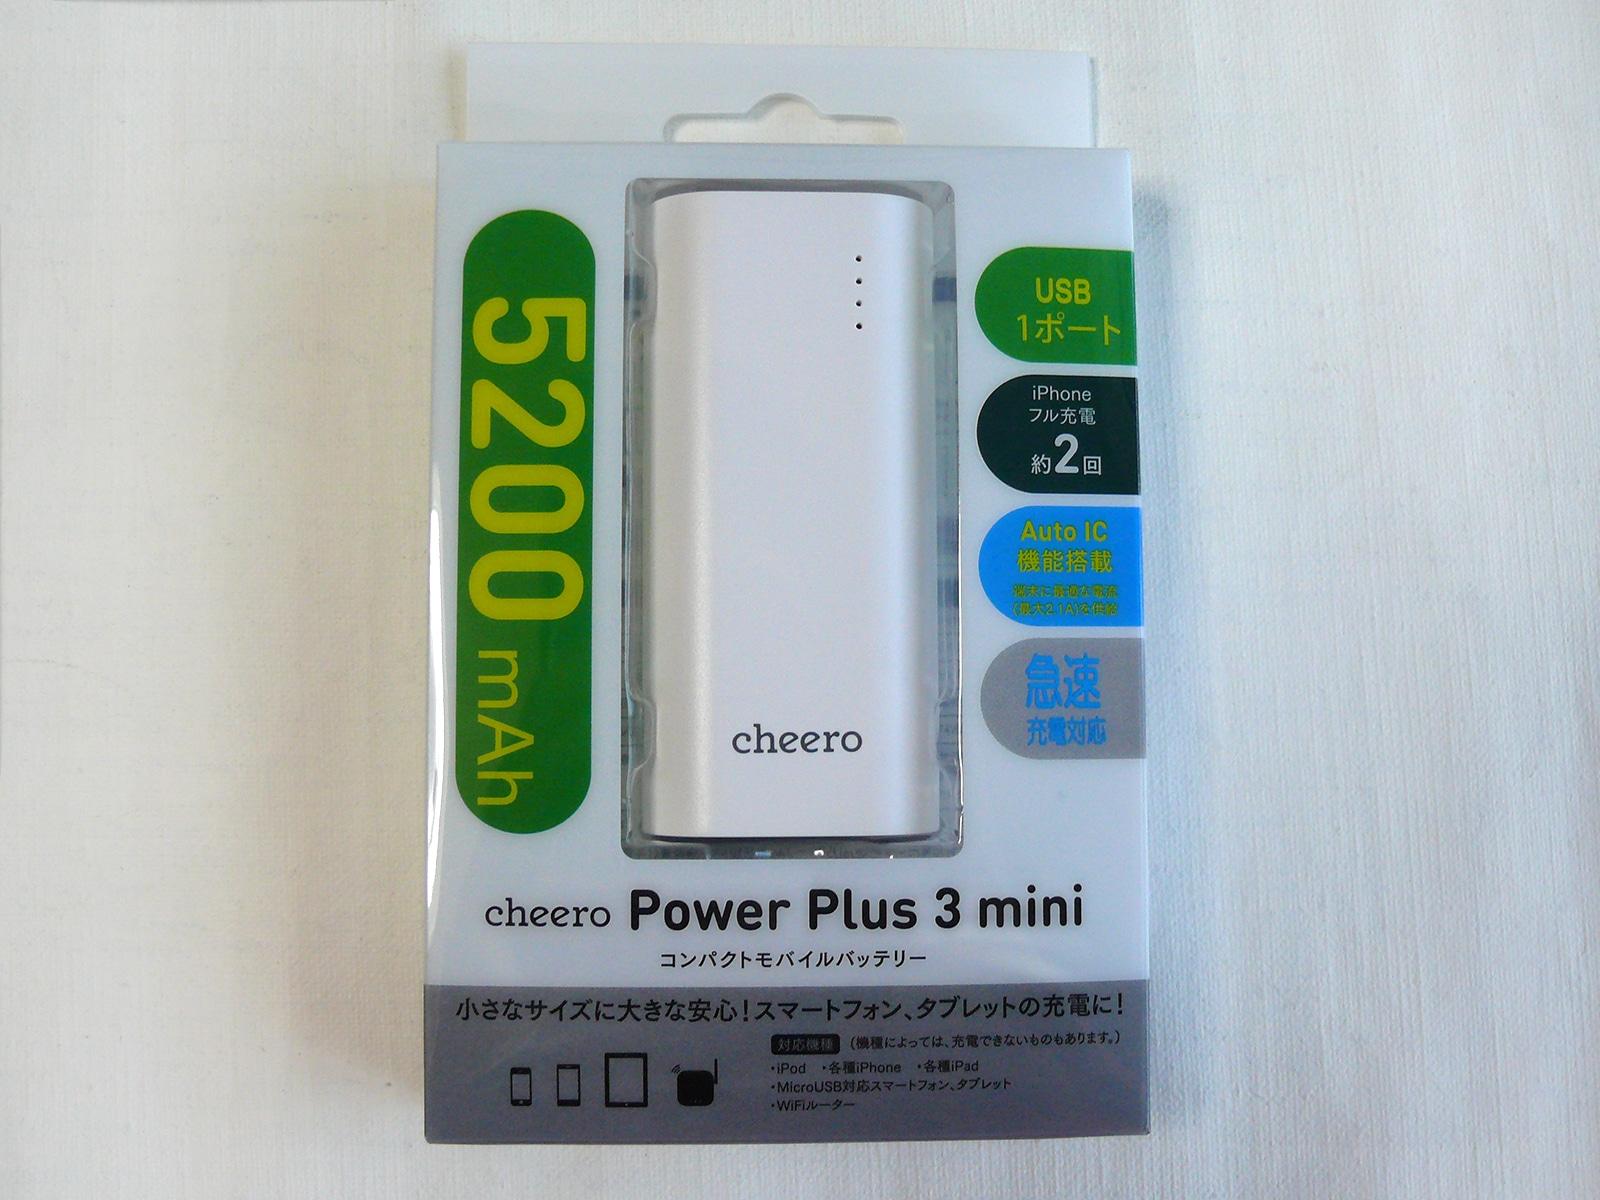 cheero Power Plus 3 mini 5200mAh 開封 外装